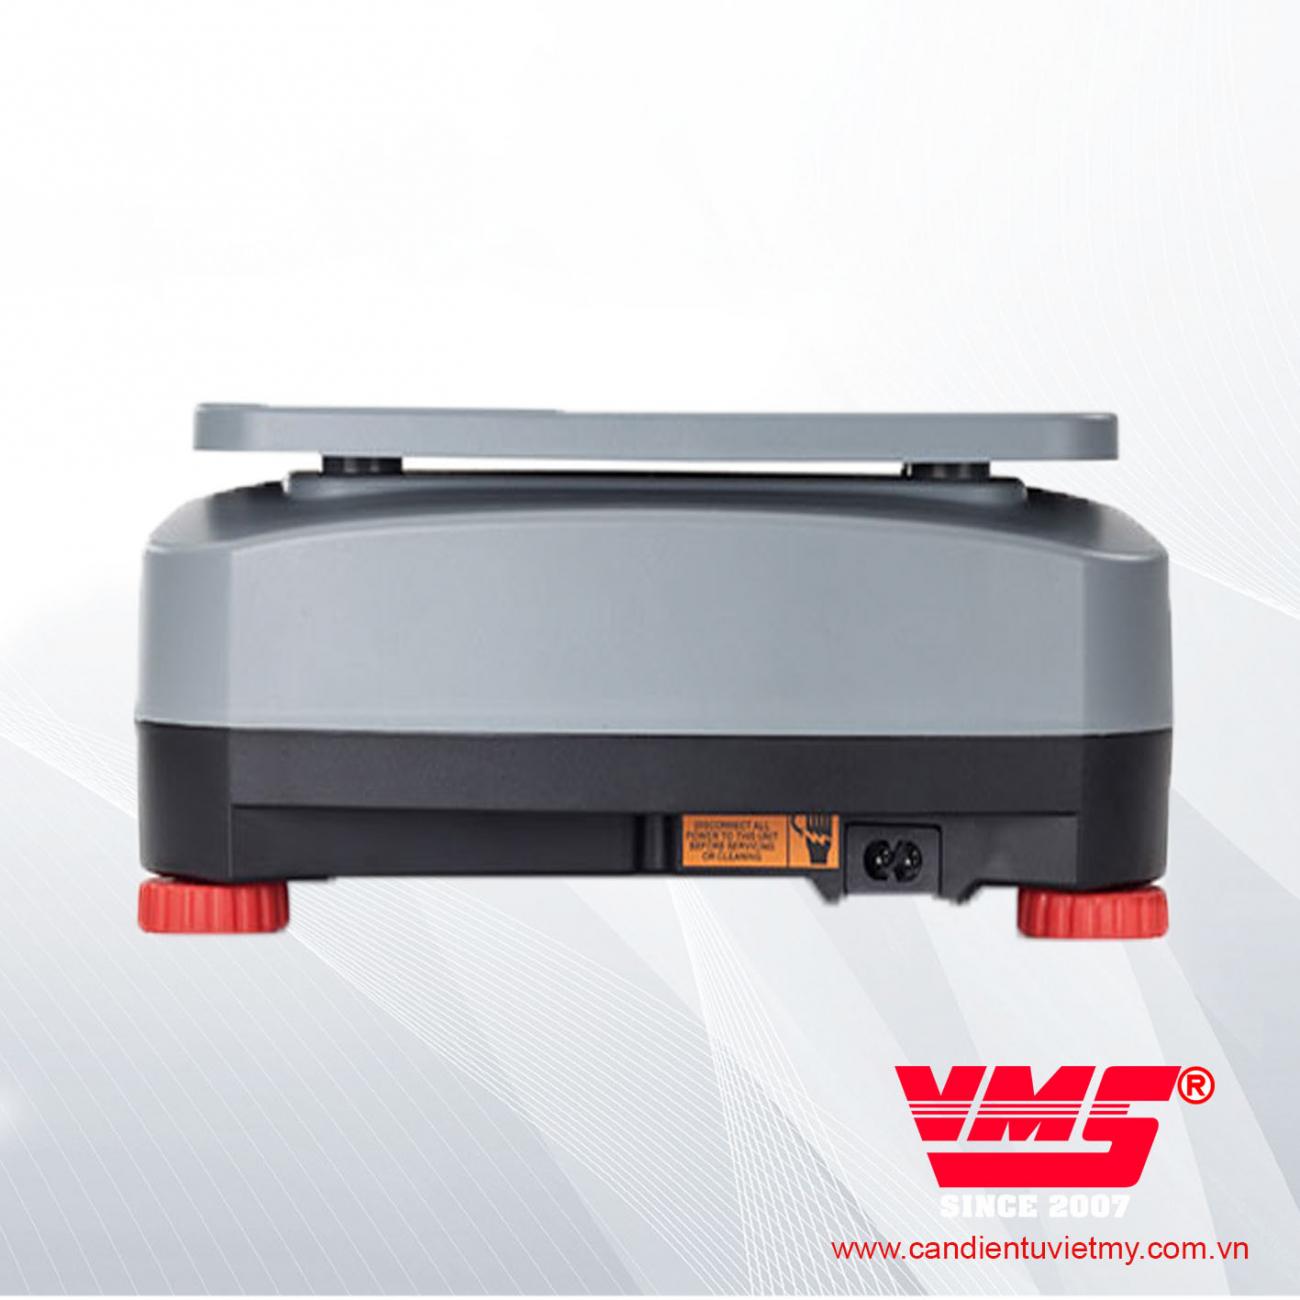 CÂN ĐIỆN TỬ R21PE - 15KG slide 0